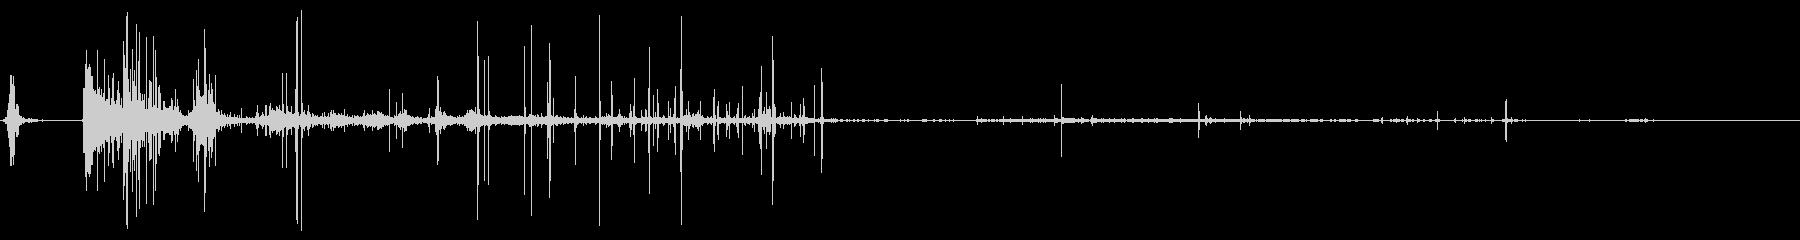 Axeによる斬首、5つのバージョンの未再生の波形